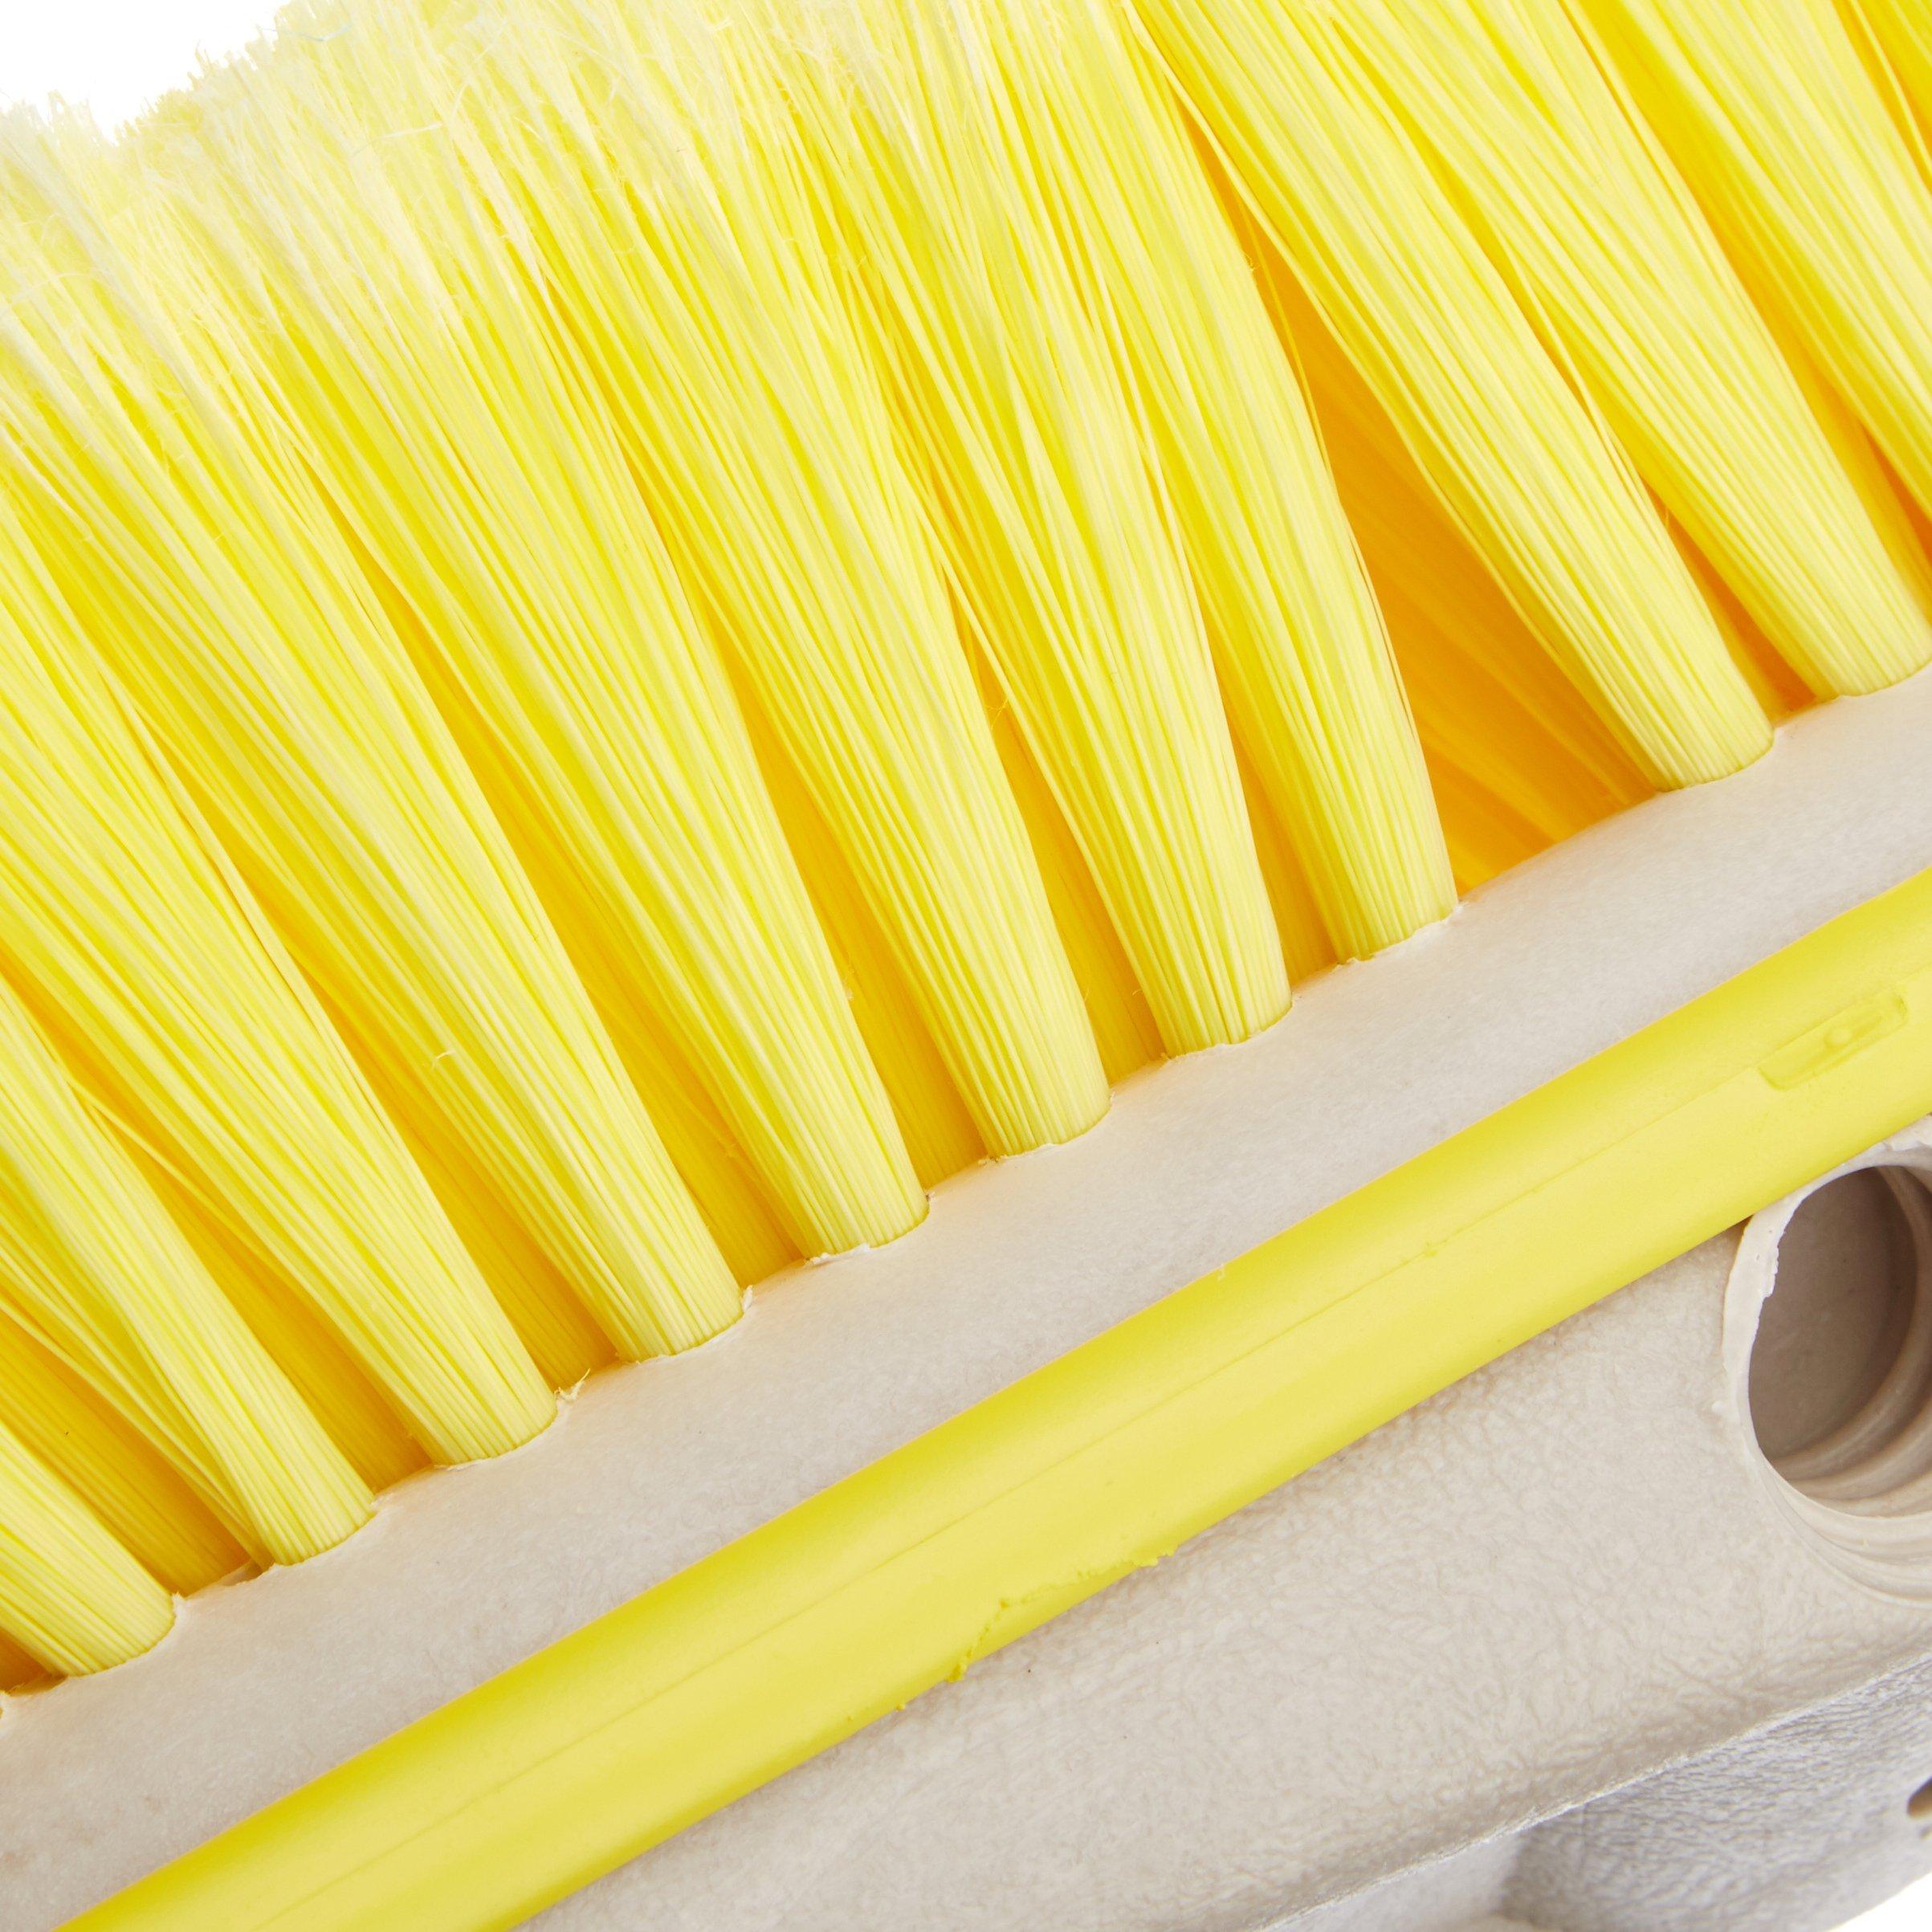 Star brite Soft Premium Wash Brush by Star Brite (Image #5)